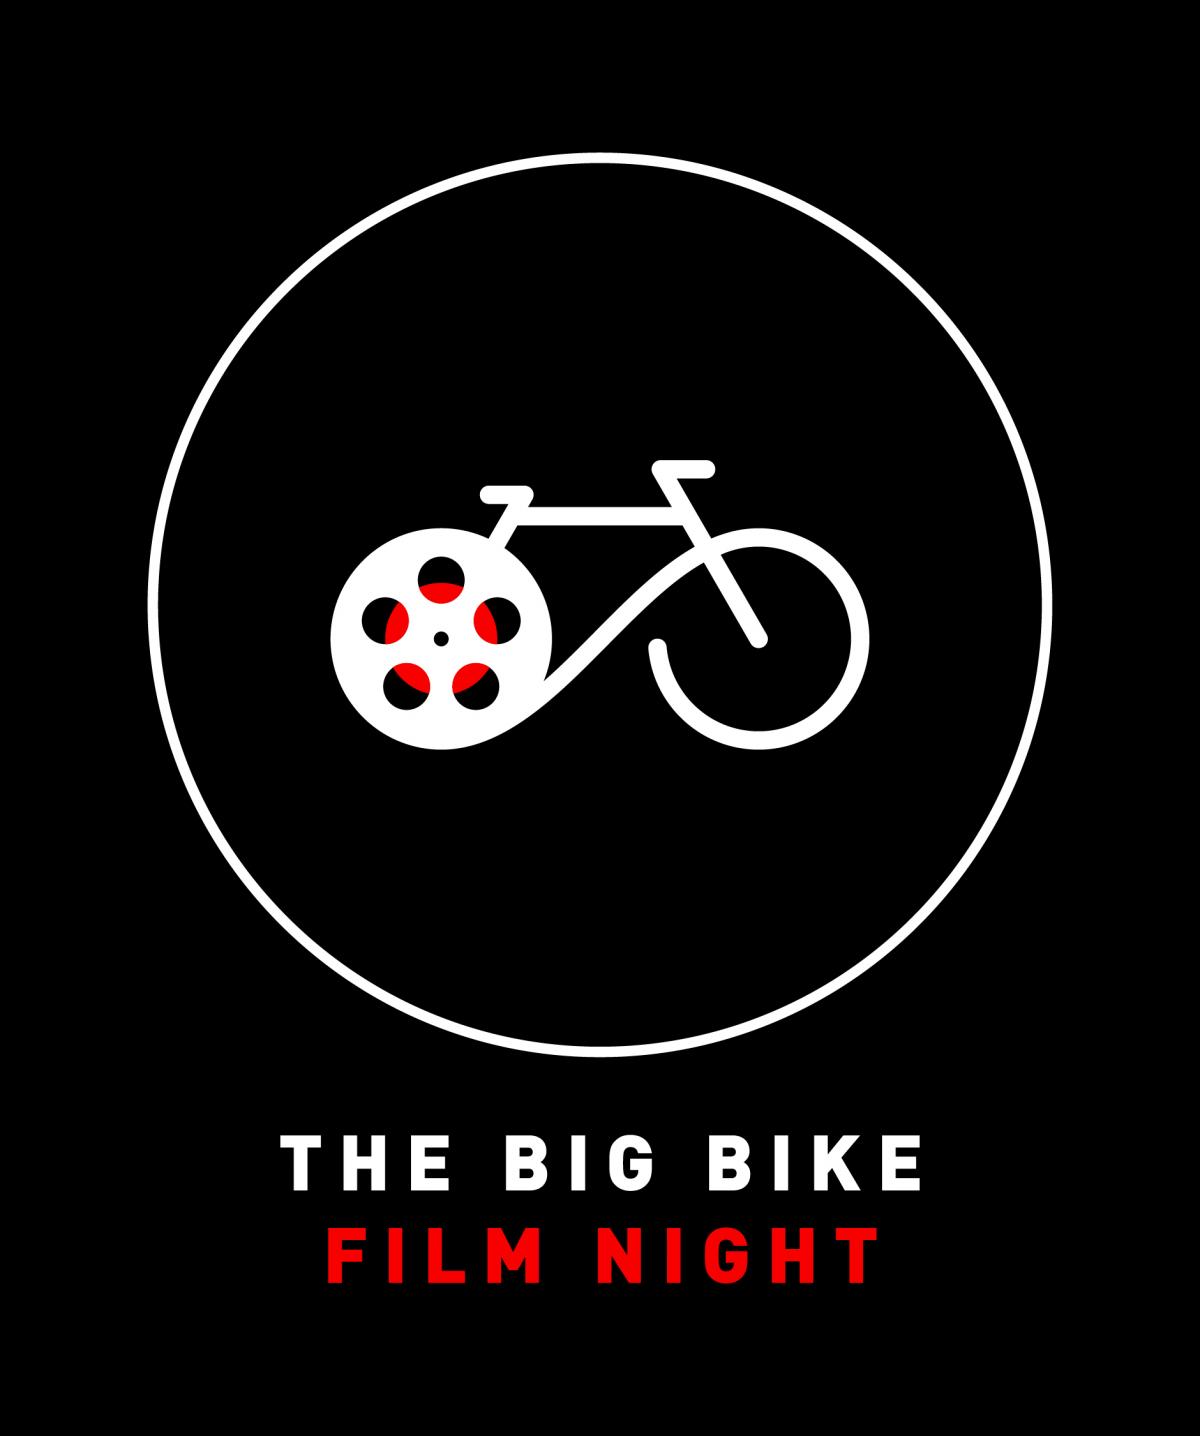 The Big Bike Film Night - Launceston